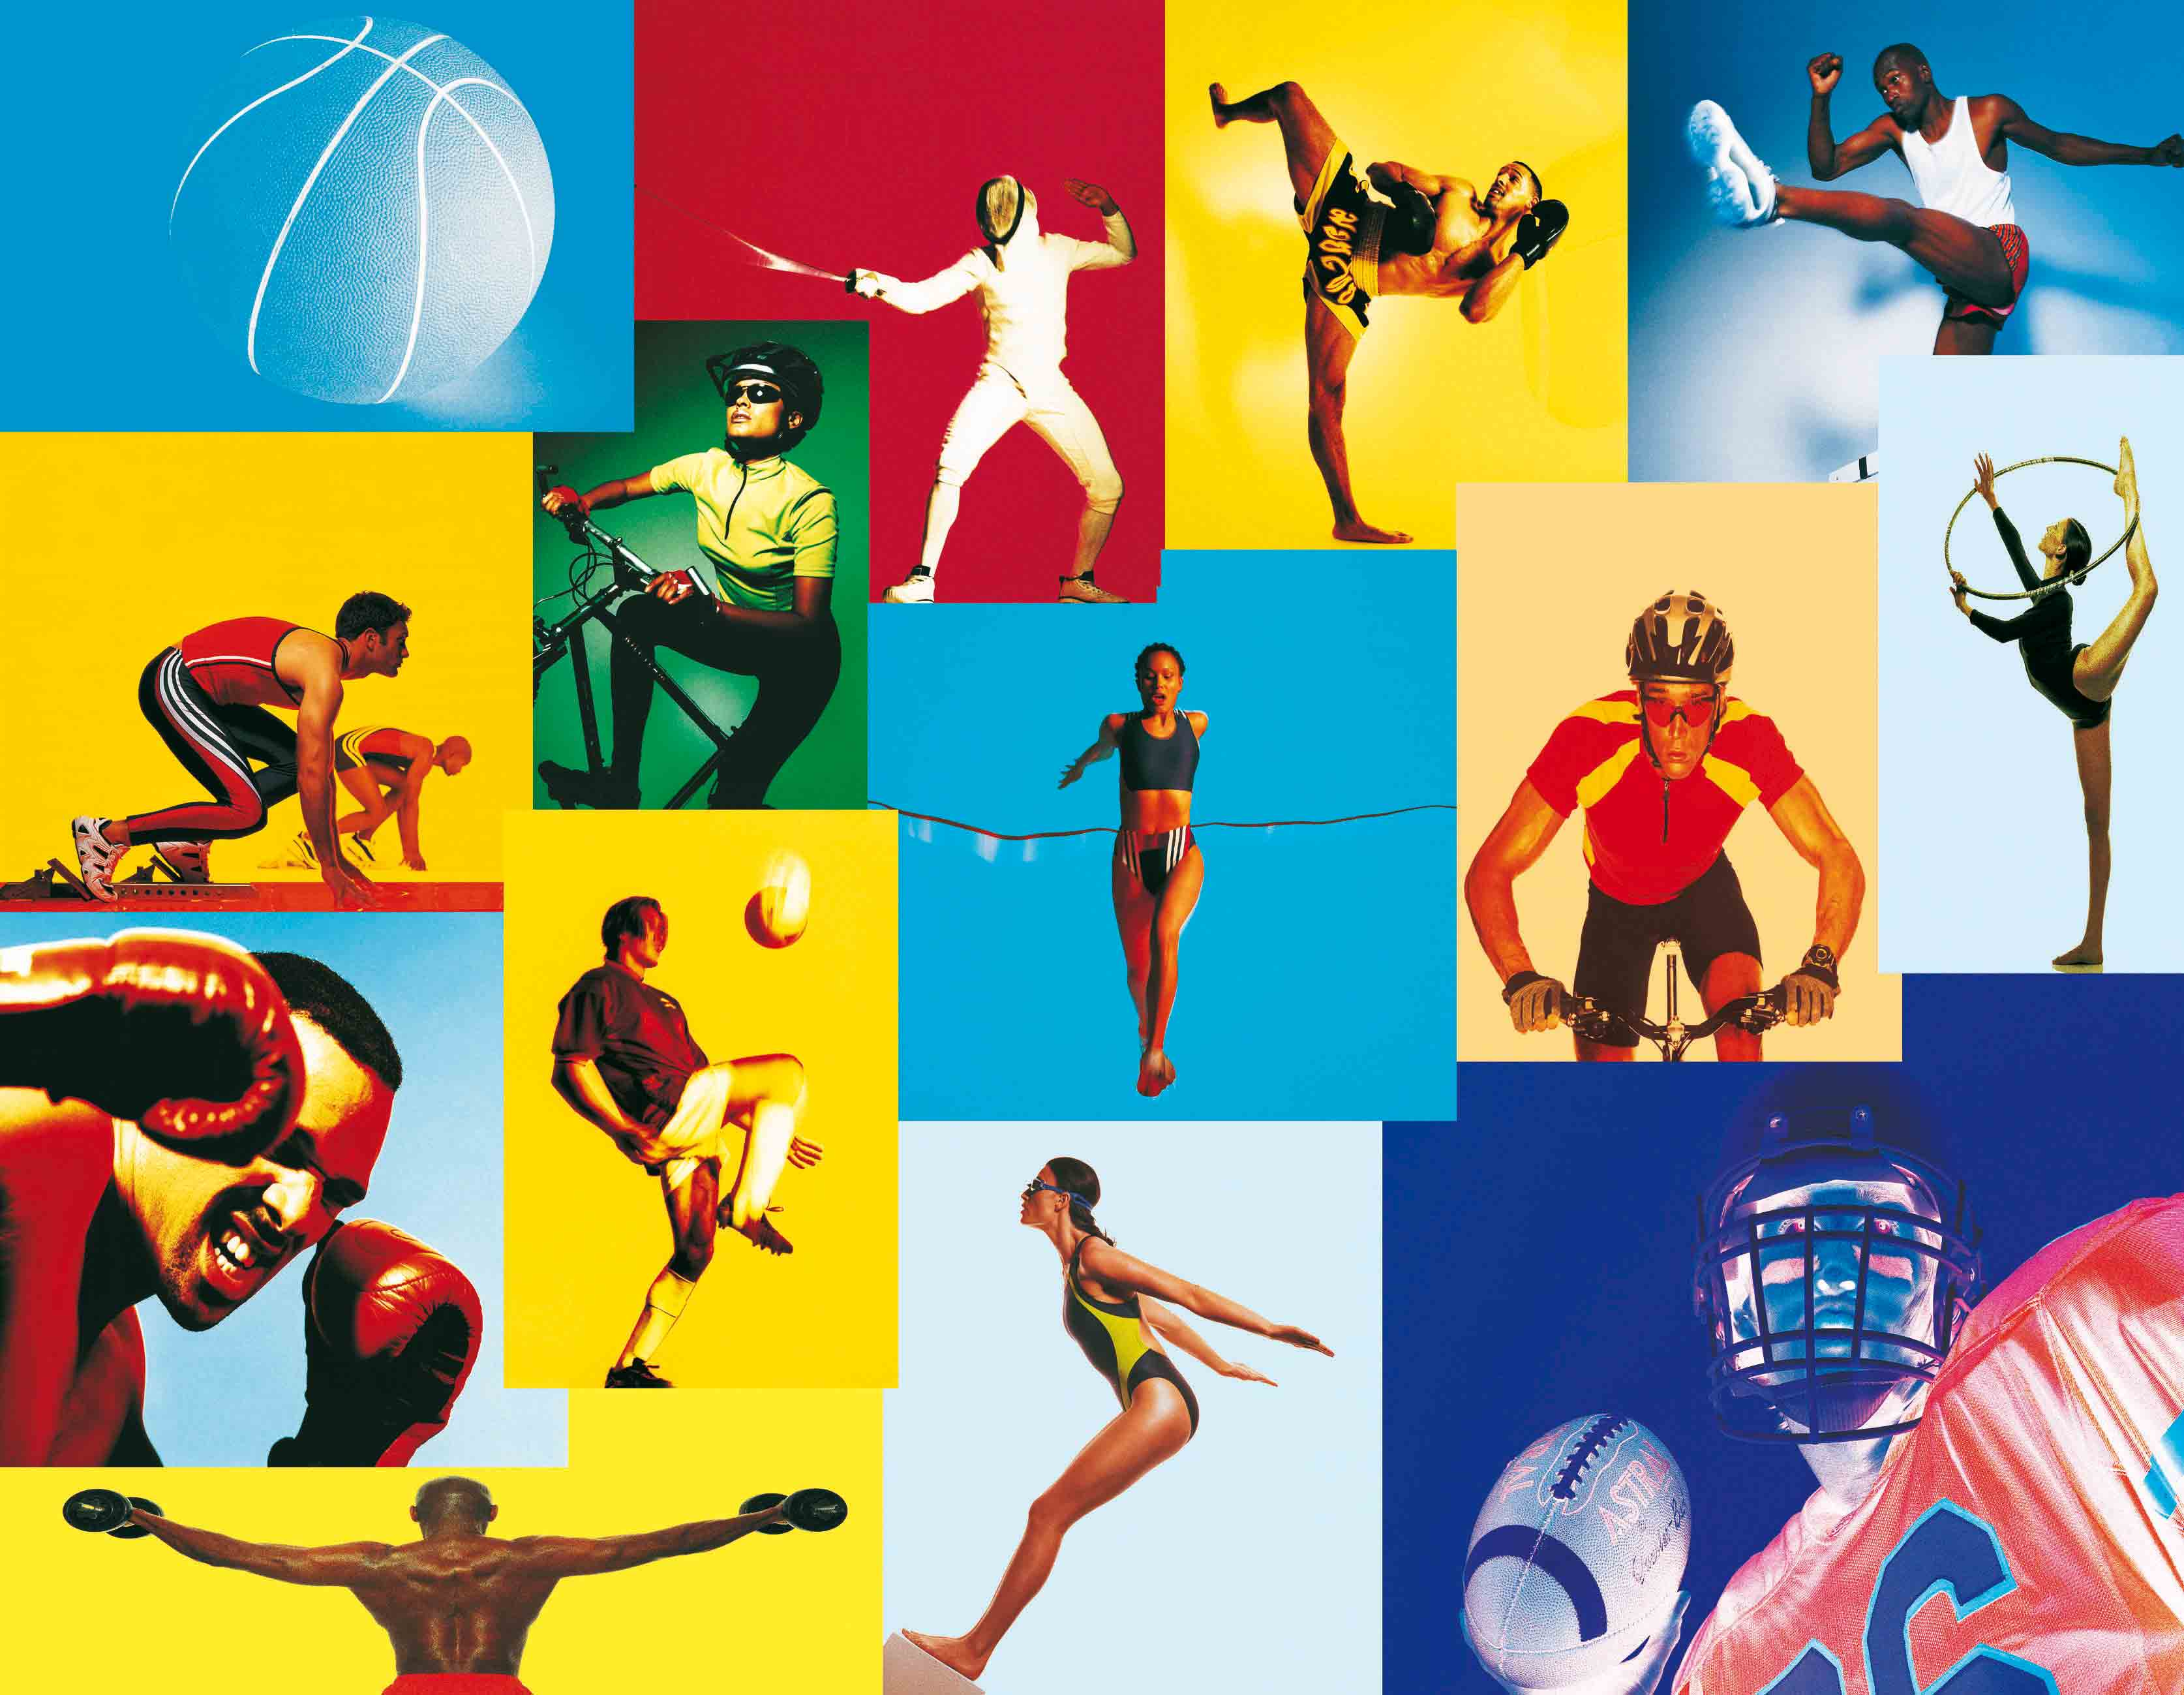 Физкультура и спорт картинки для презентации, для девушки